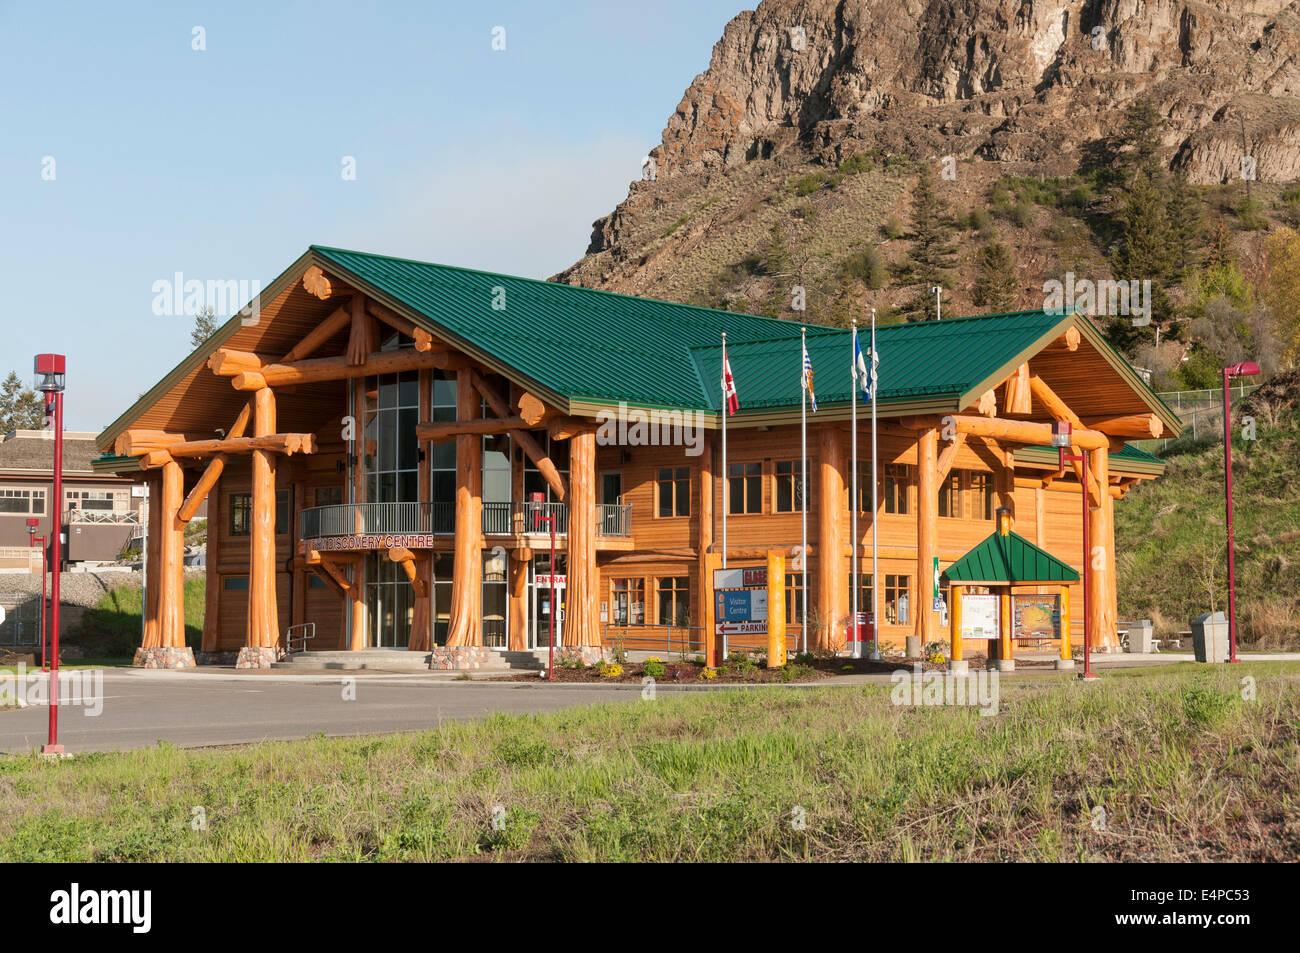 Elk203-3139 Kanada, Britisch-Kolumbien, Williams Lake, Tourismus Discovery Center Stockbild